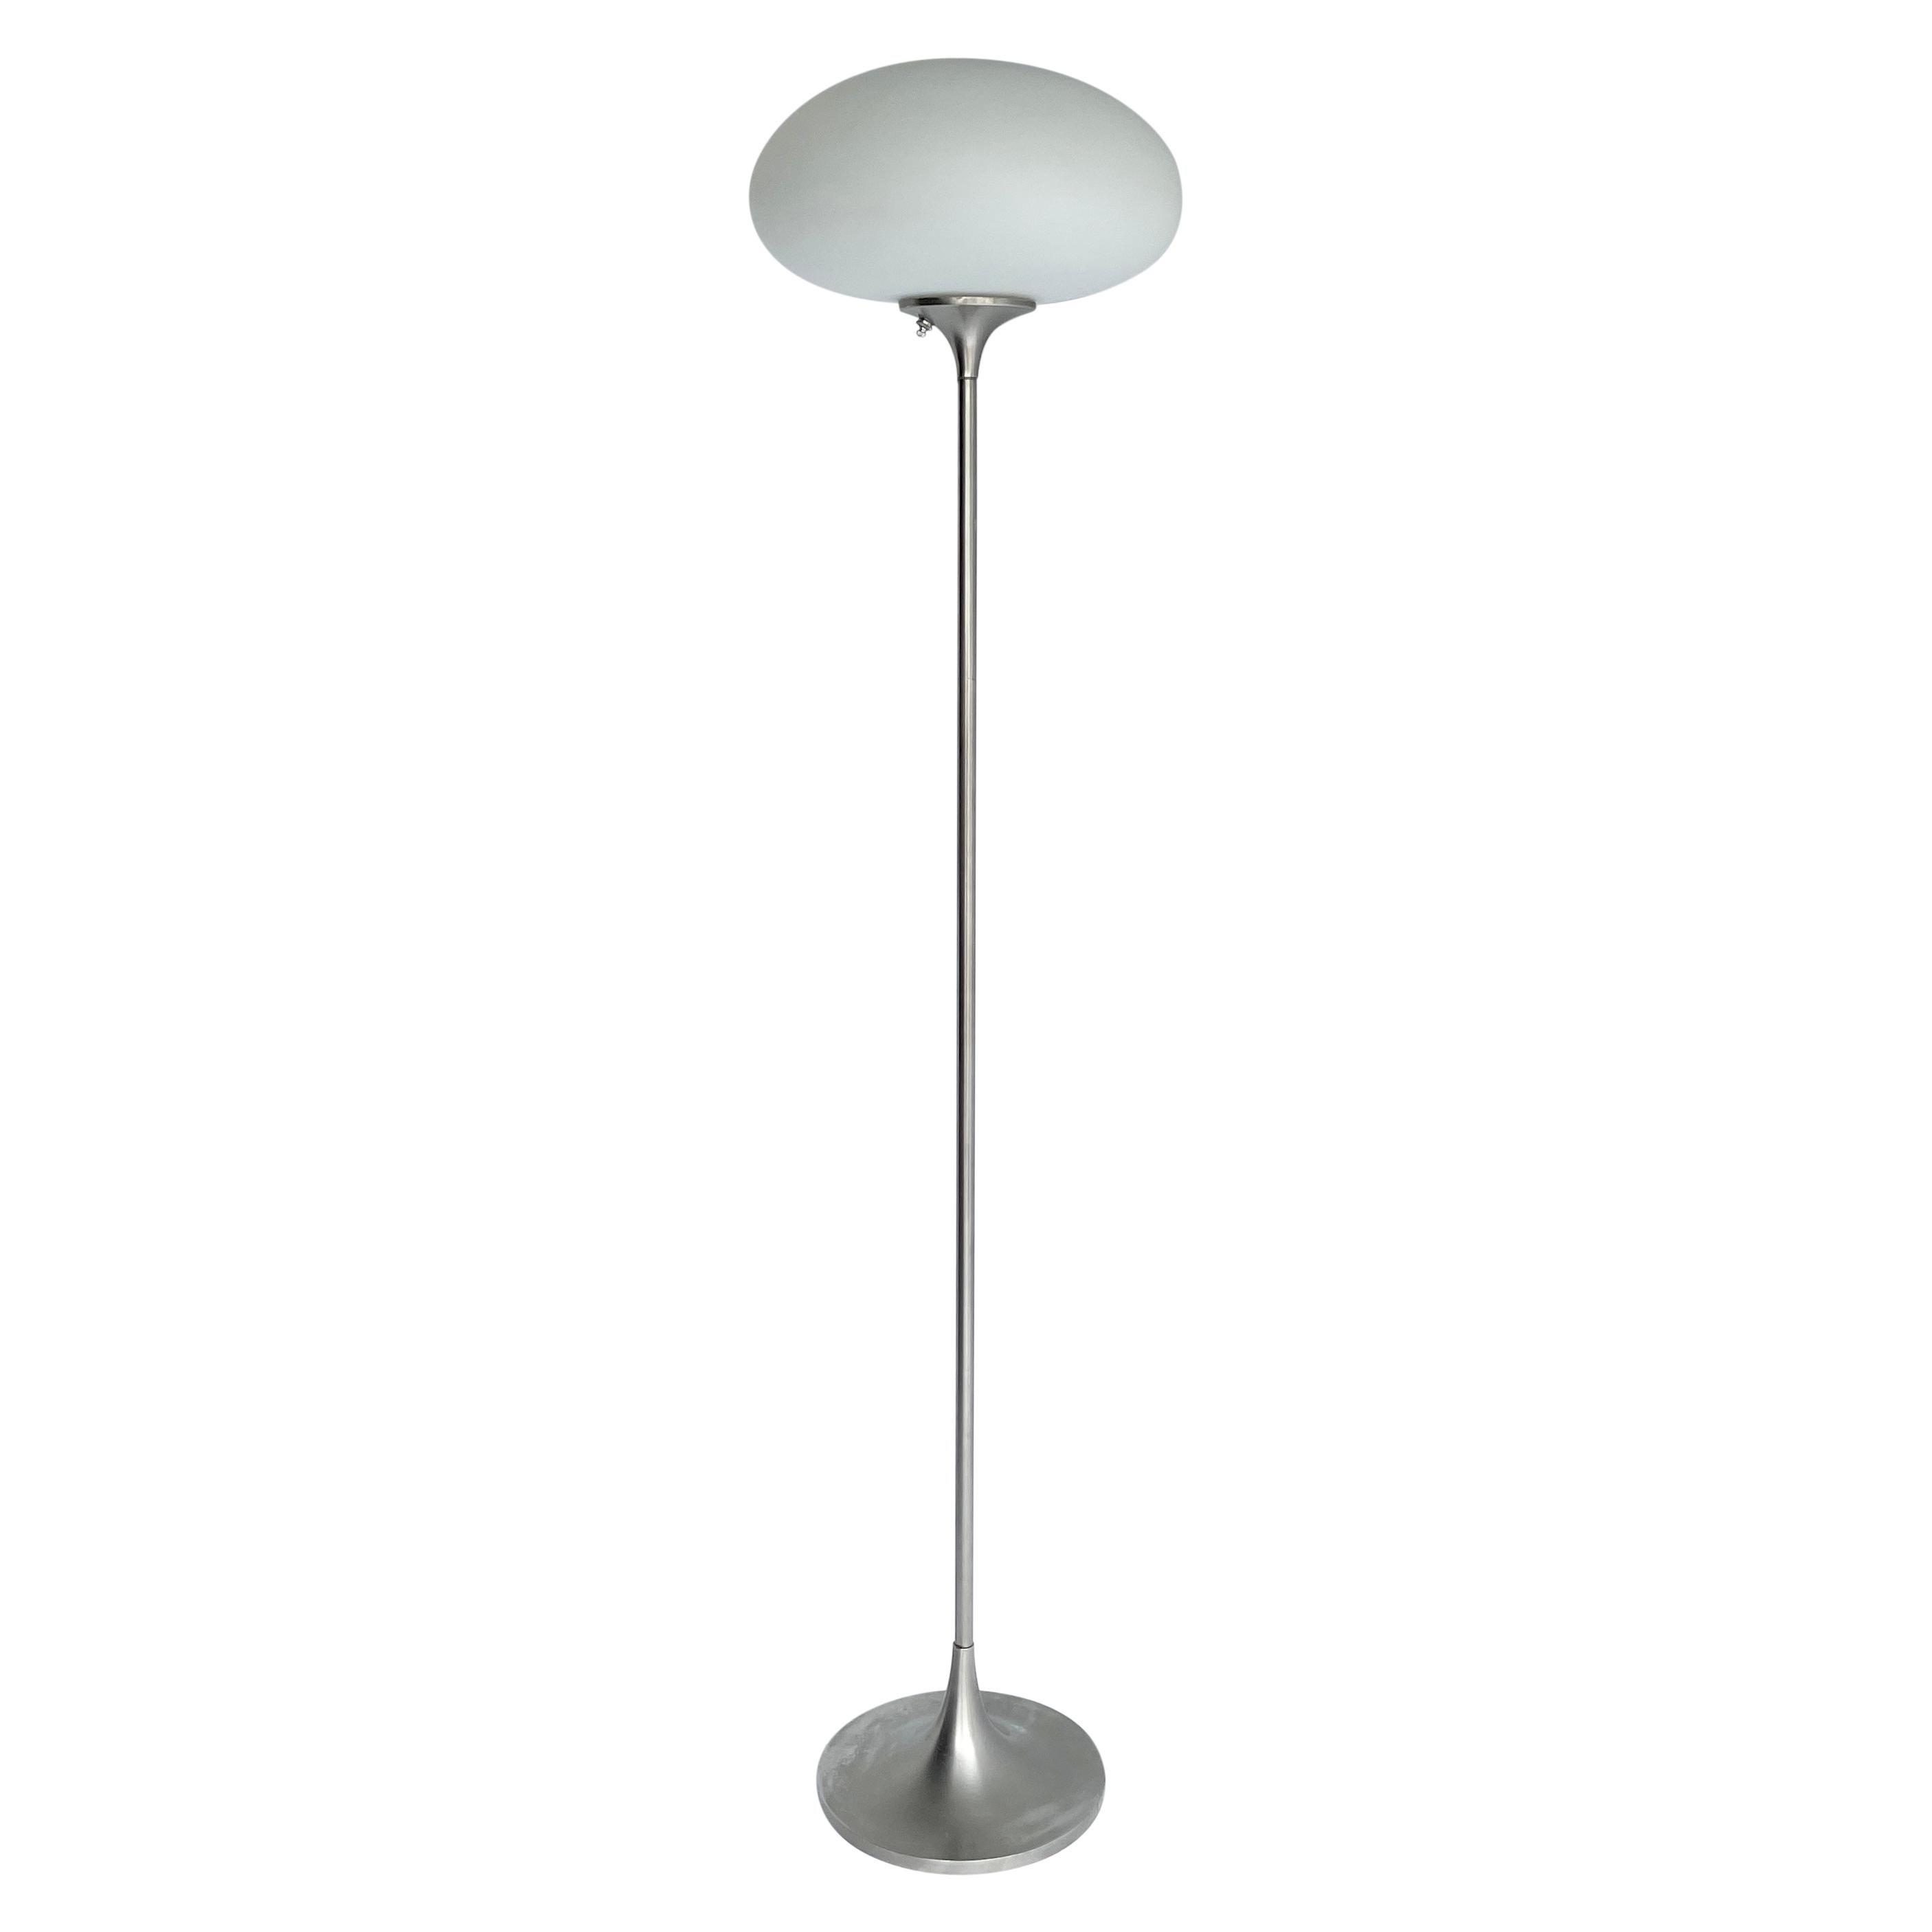 Mid-Century Modern Aluminum Laurel Mushroom Floor Lamp, 1973